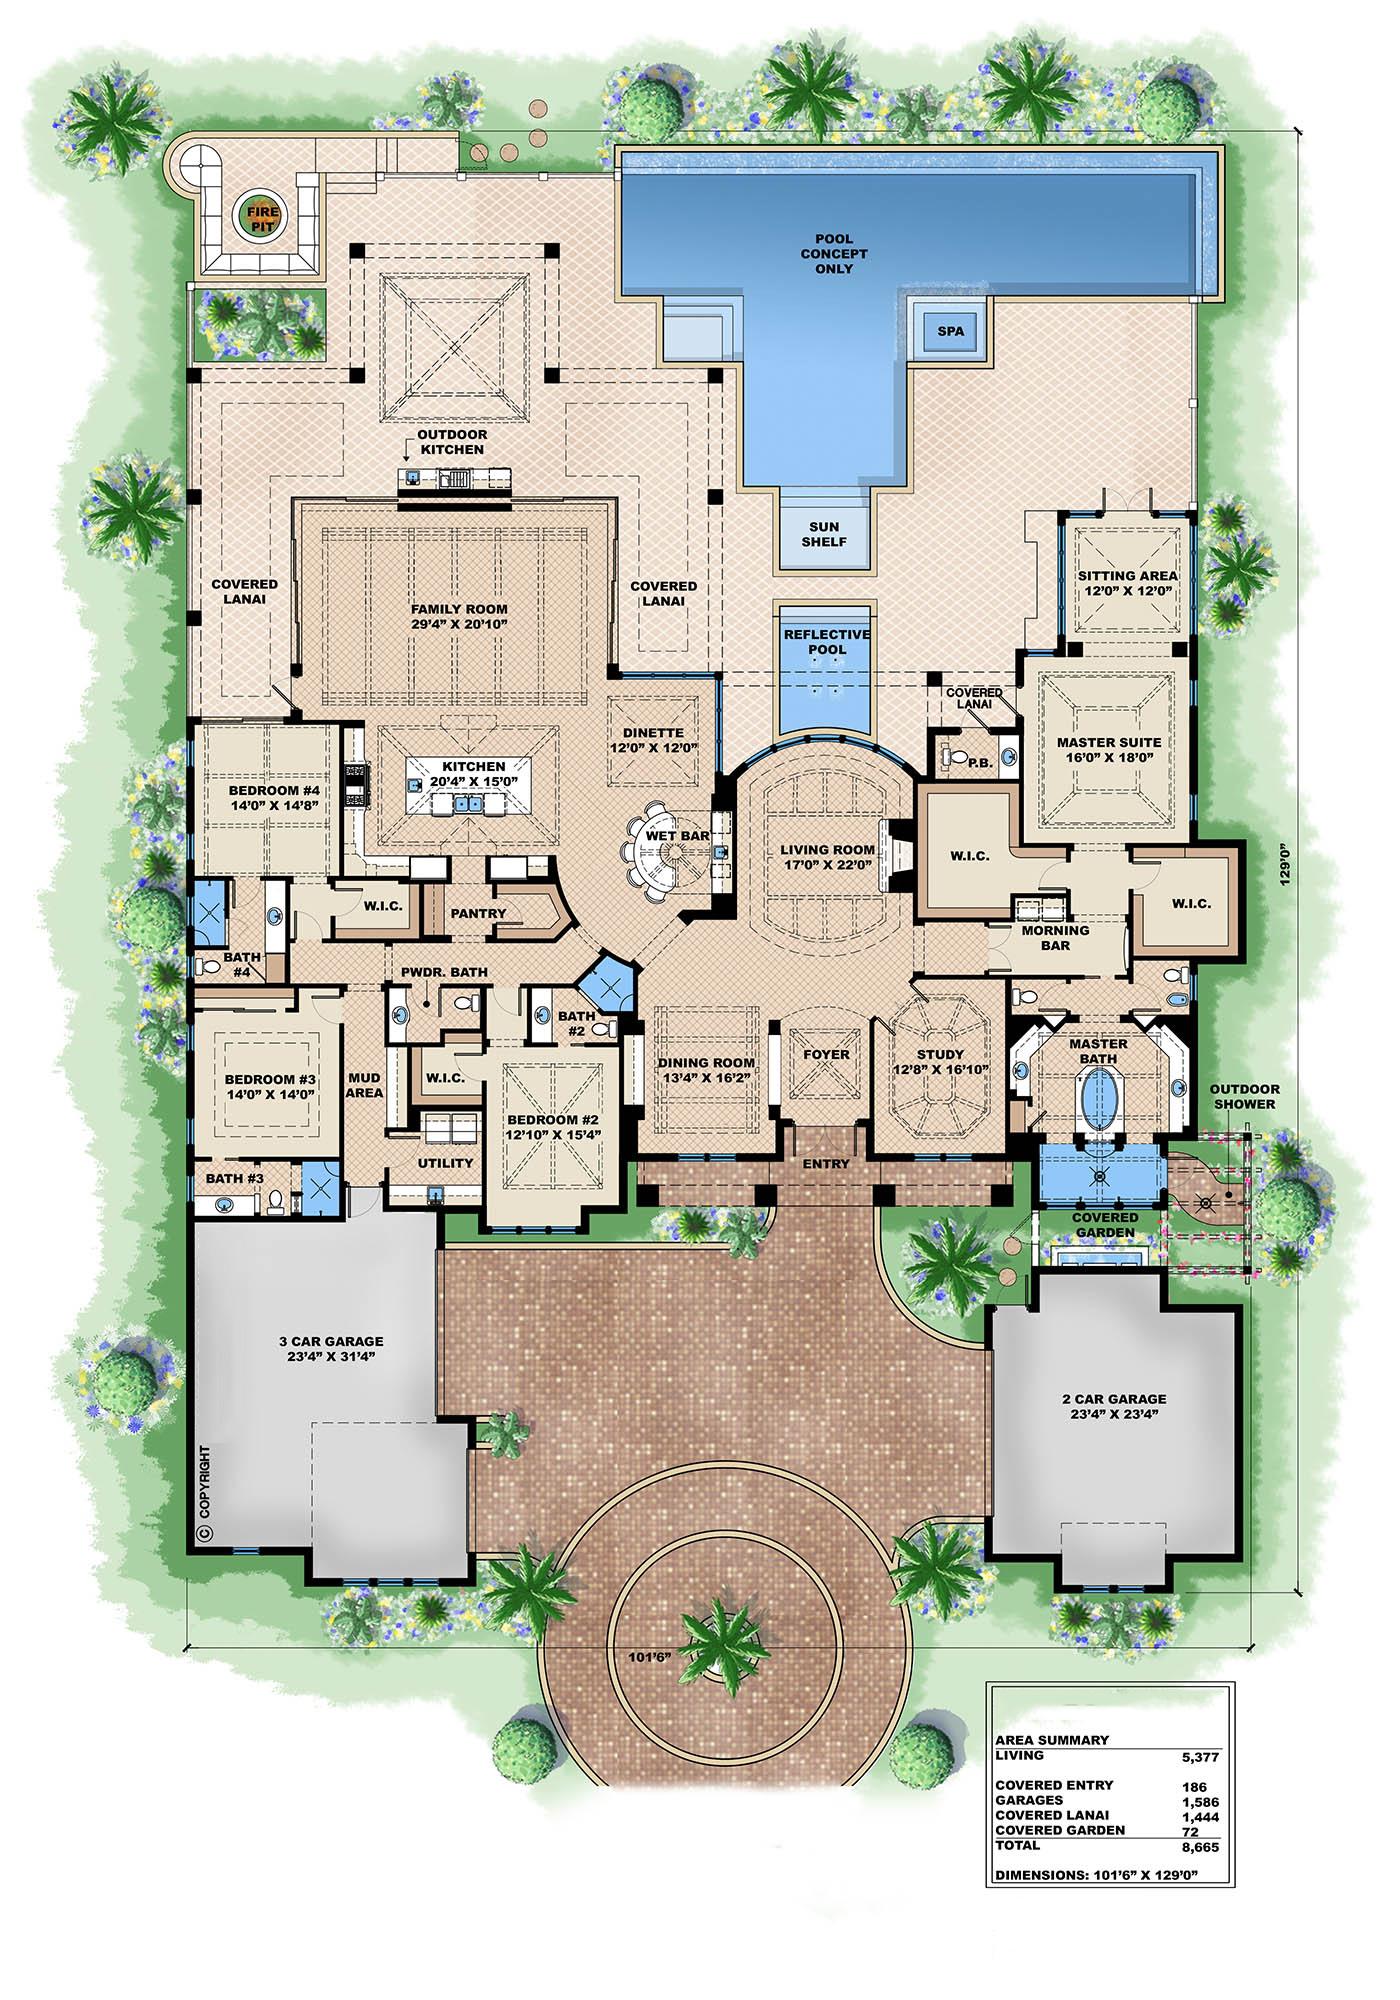 Superb 4 Bedroom Dream House Plans Part - 4: European Style House Plan - 4 Beds 4.75 Baths 8665 Sq-Ft Plan #27